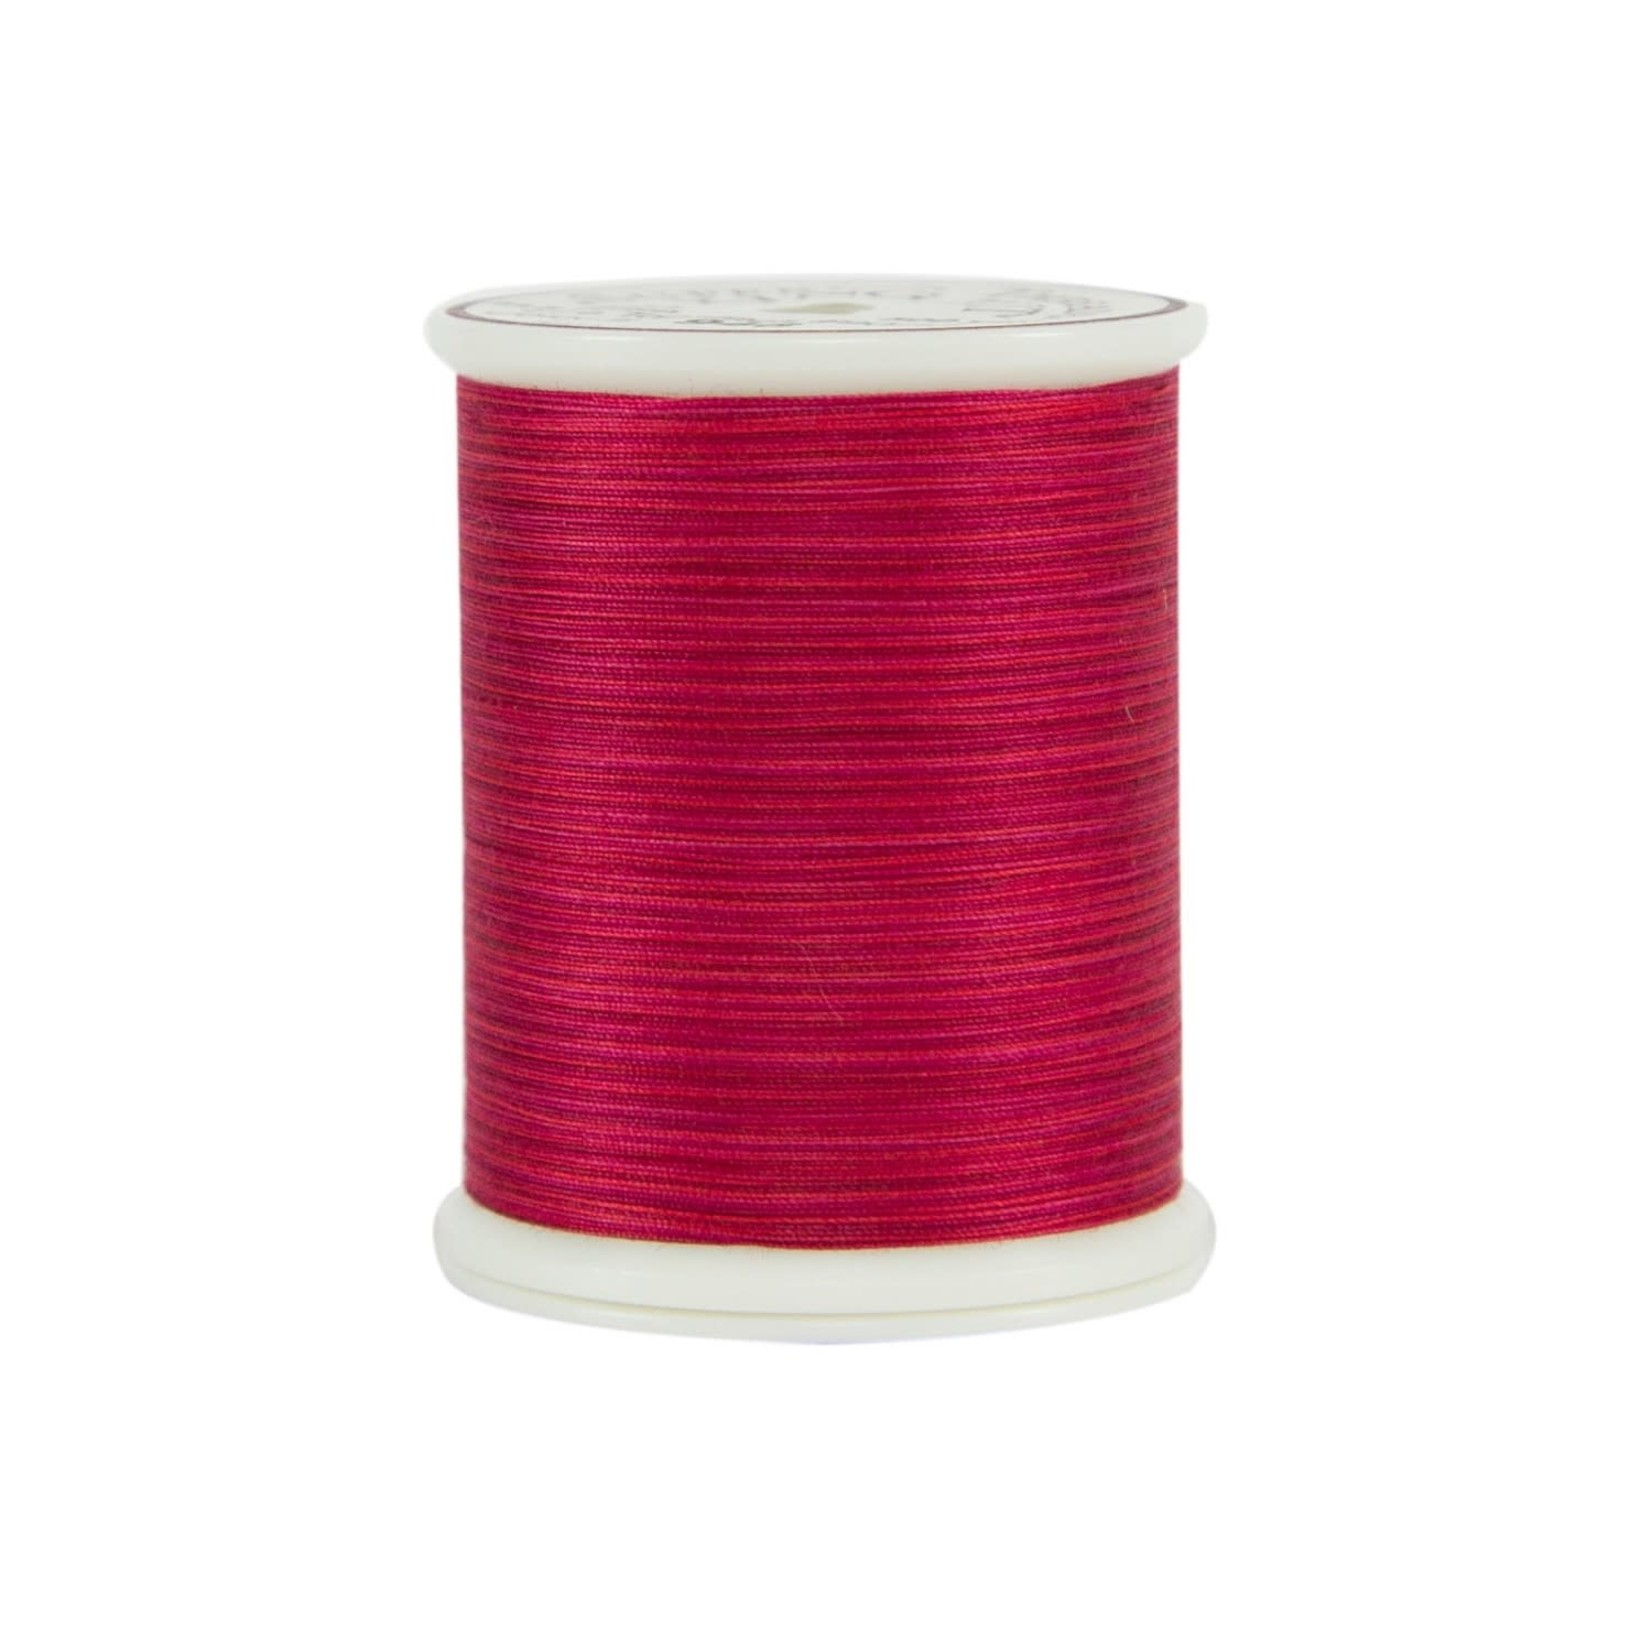 Superior Threads King Tut - #40 - 457 m - 0946 Rubiyah